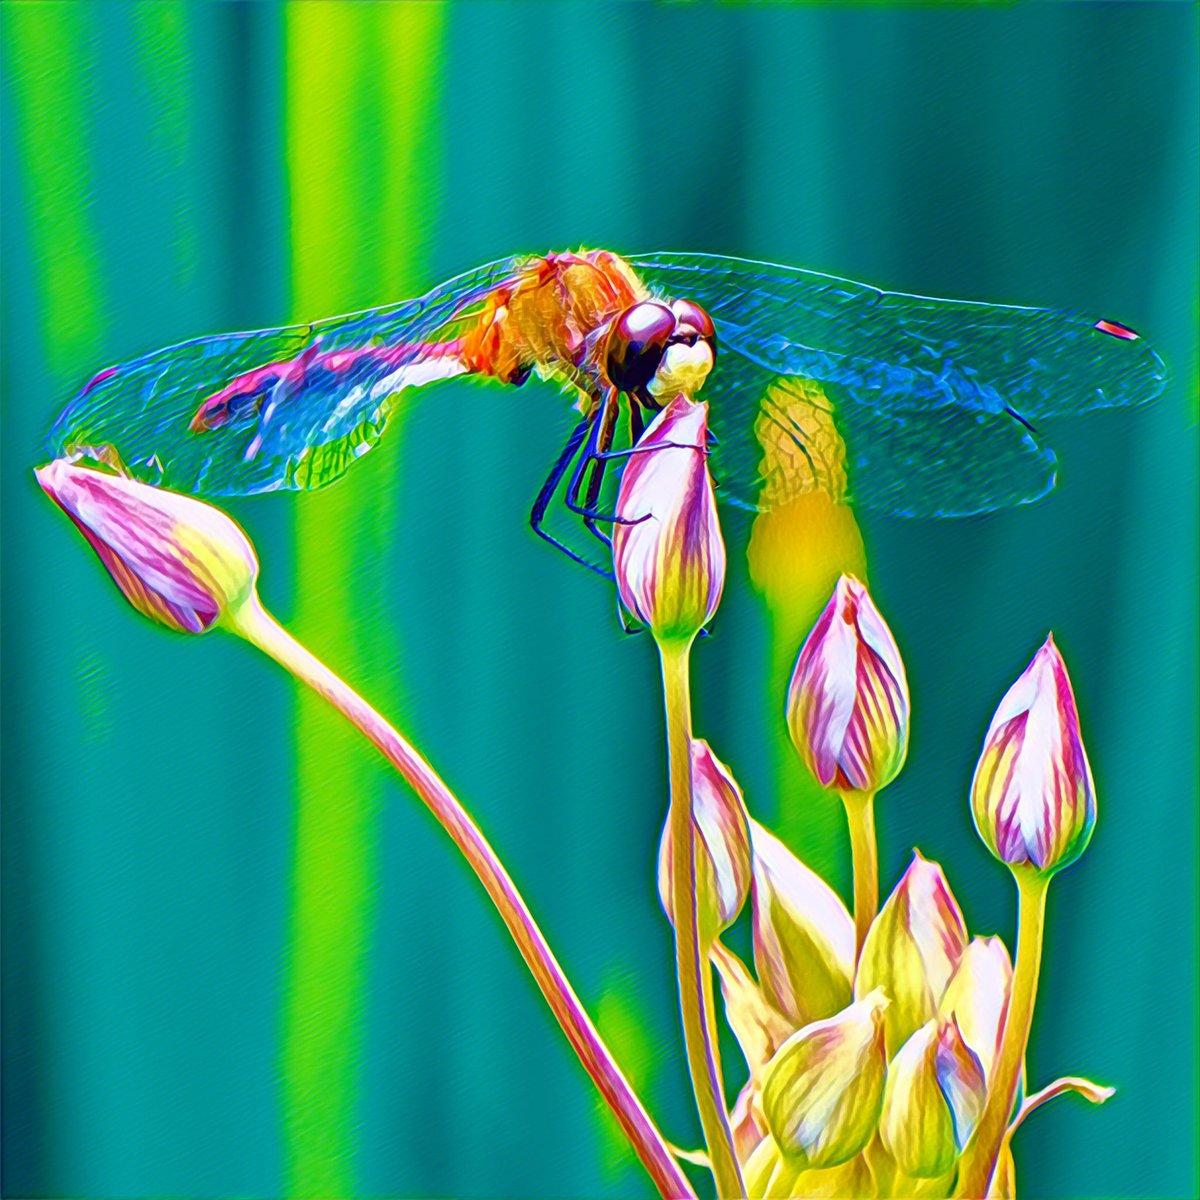 #ottawa #canada #myottawa #colours #bloom #instalike #instagood #macro #macrophotography #closeup #prisma #shotonnikon #d850 #colour #bloom #flower #flowers #dragonfly